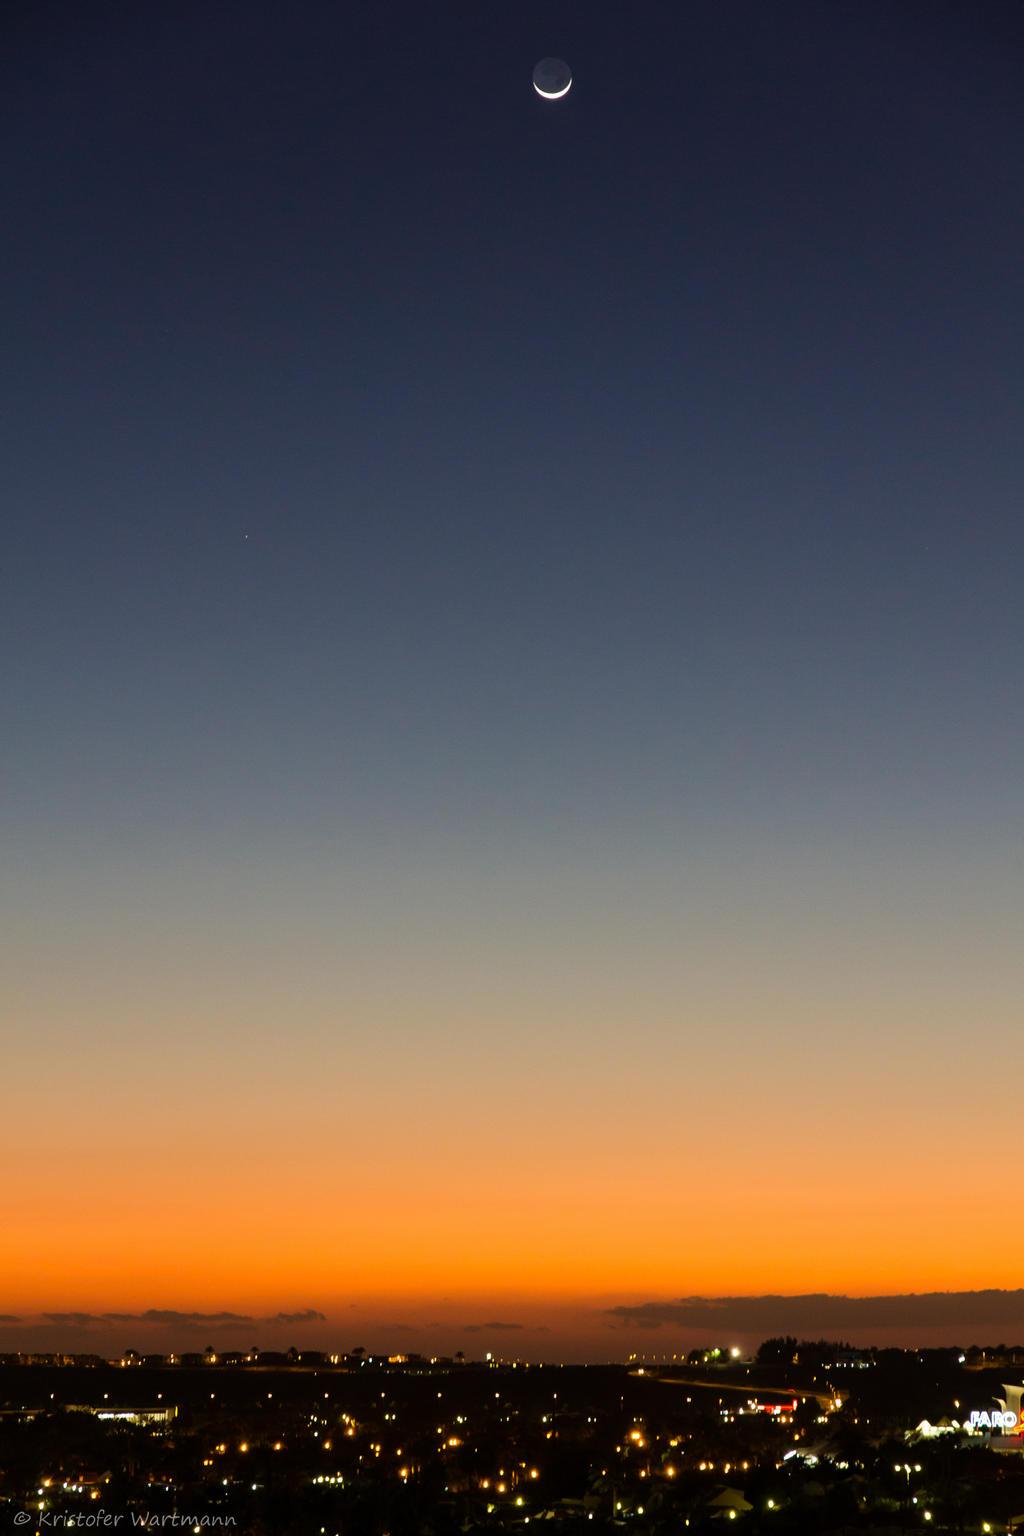 Sunset at Maspalomas by stromstoerung